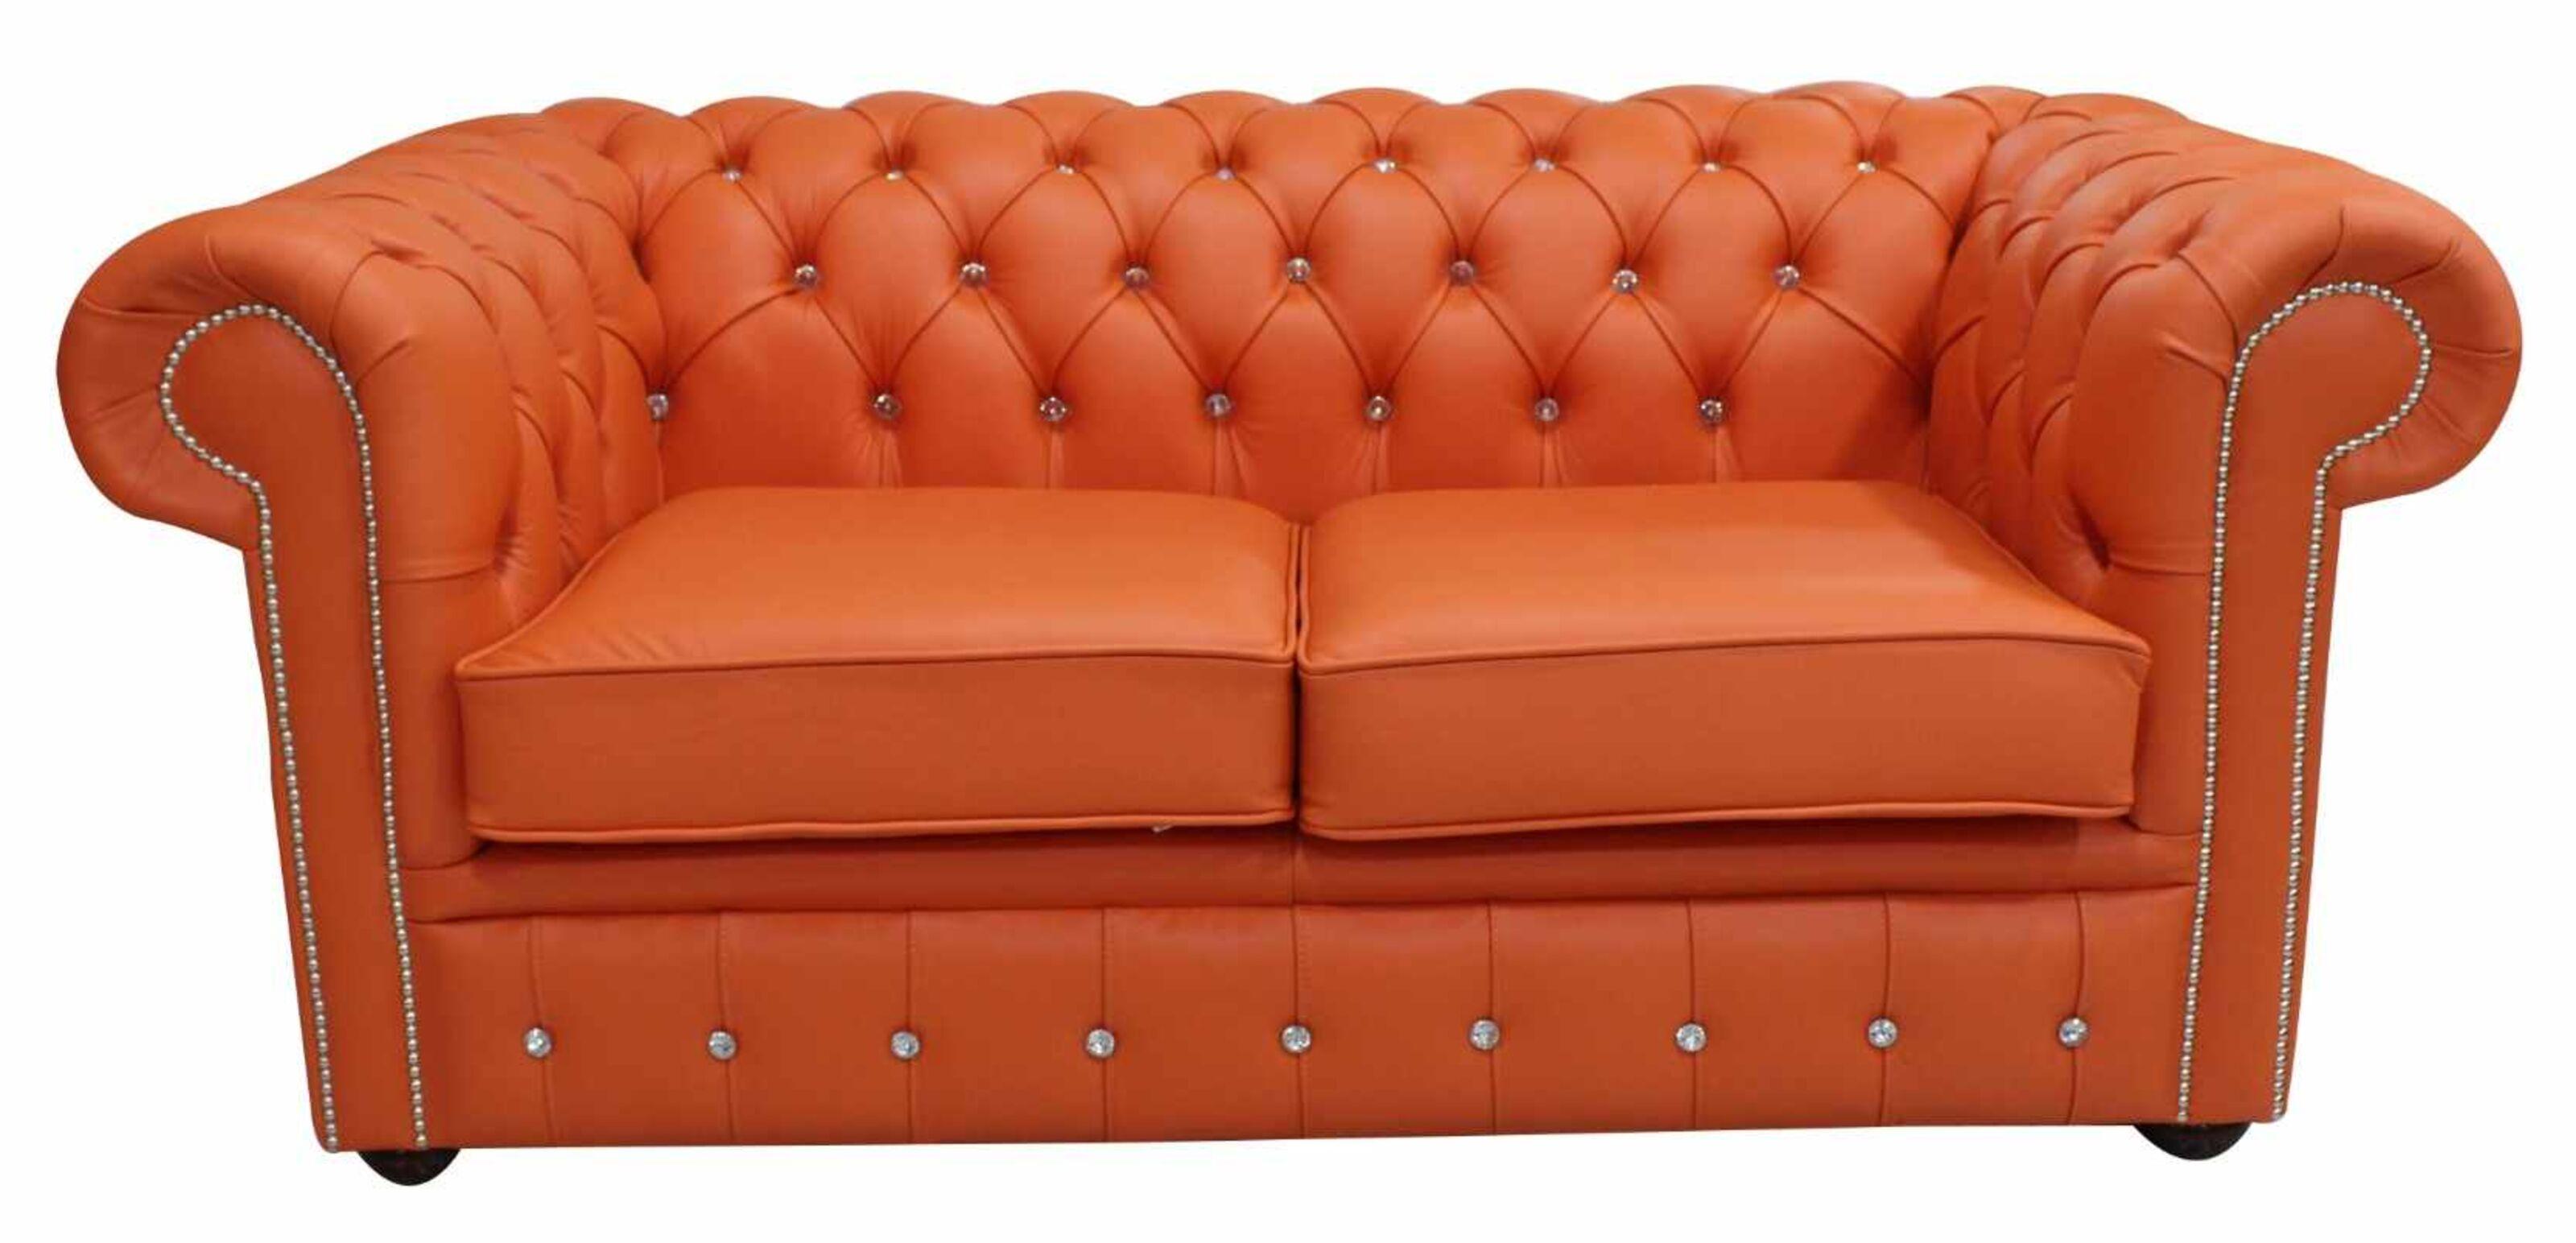 Chesterfield 2 Seater CRYSTALLIZED™ Diamond Flamenco Orange Leather Sofa  Offer